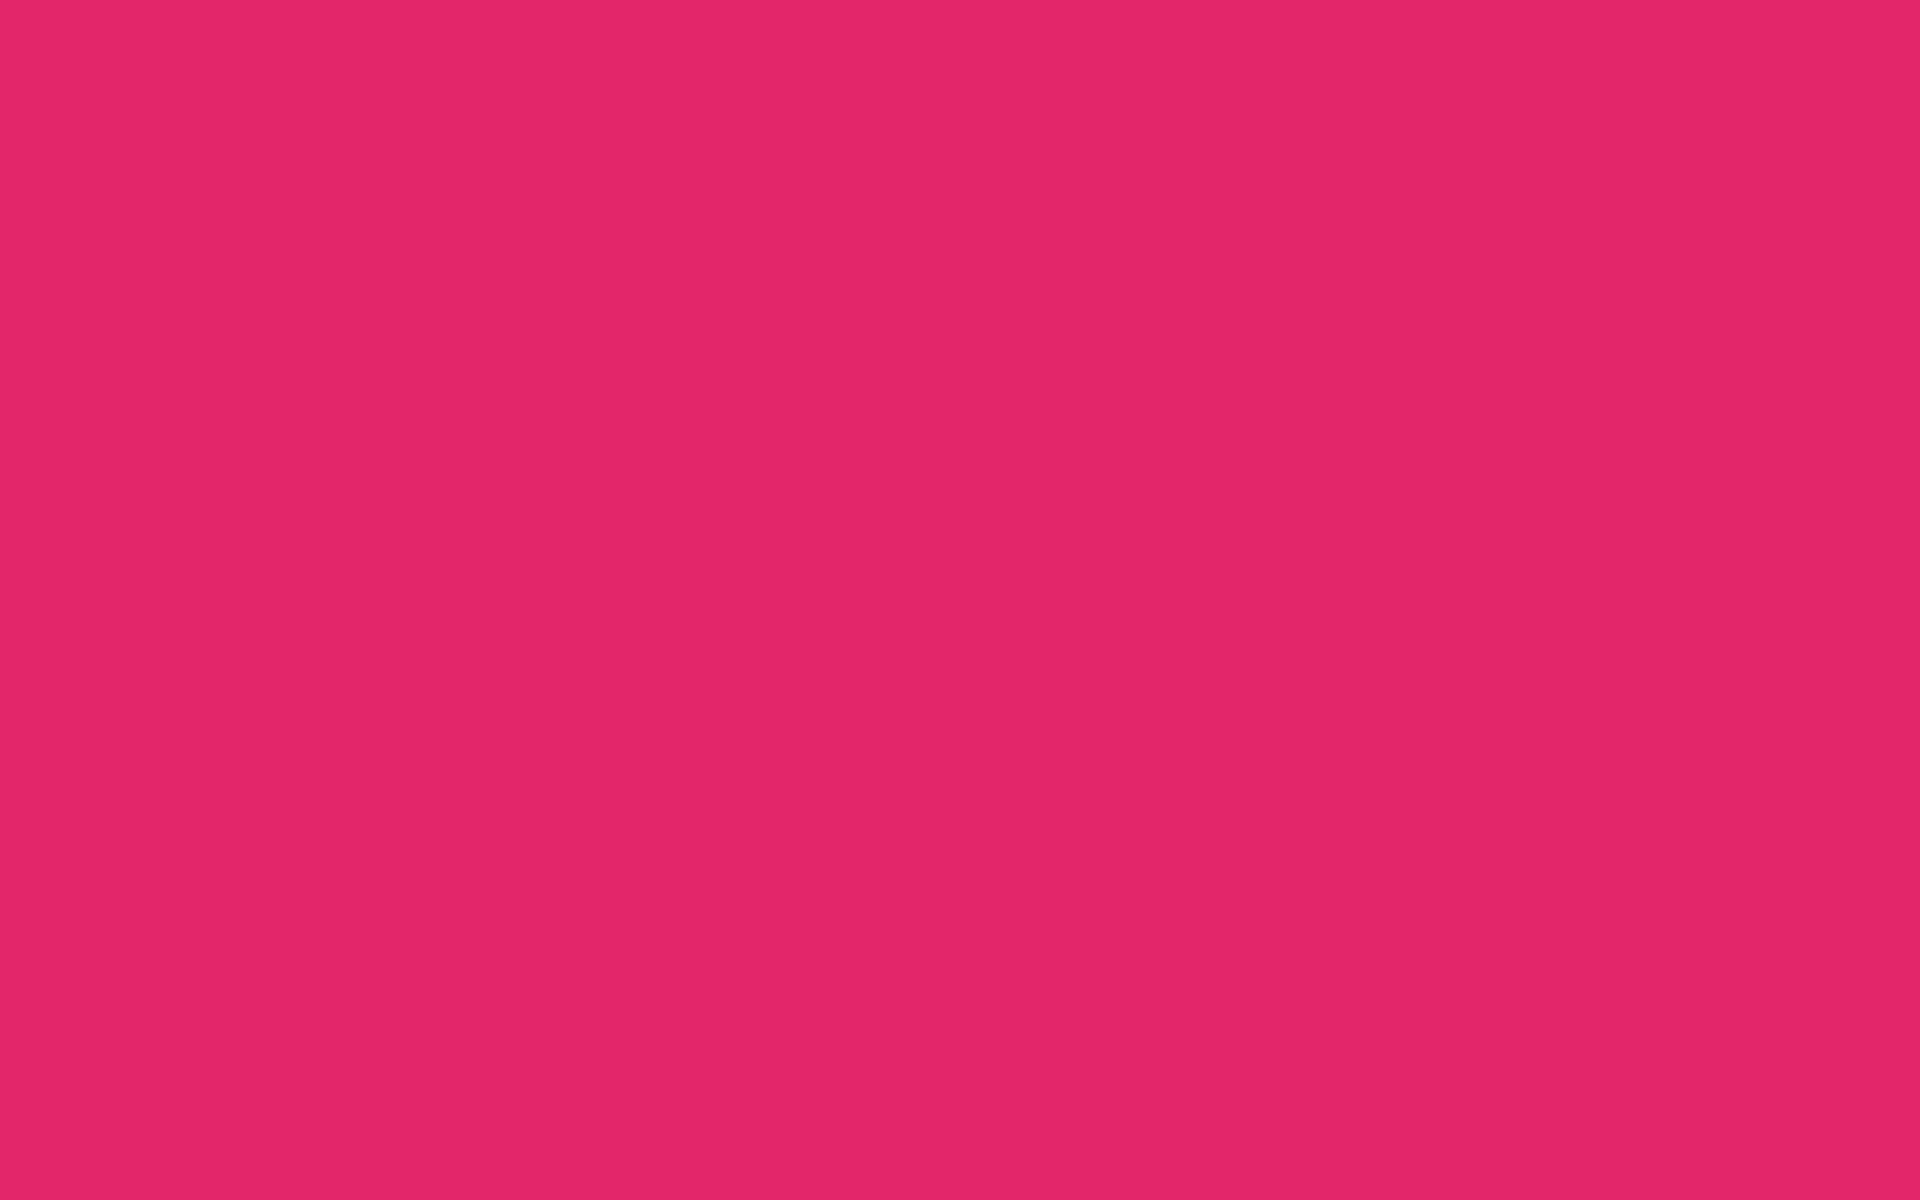 1920x1200 Razzmatazz Solid Color Background